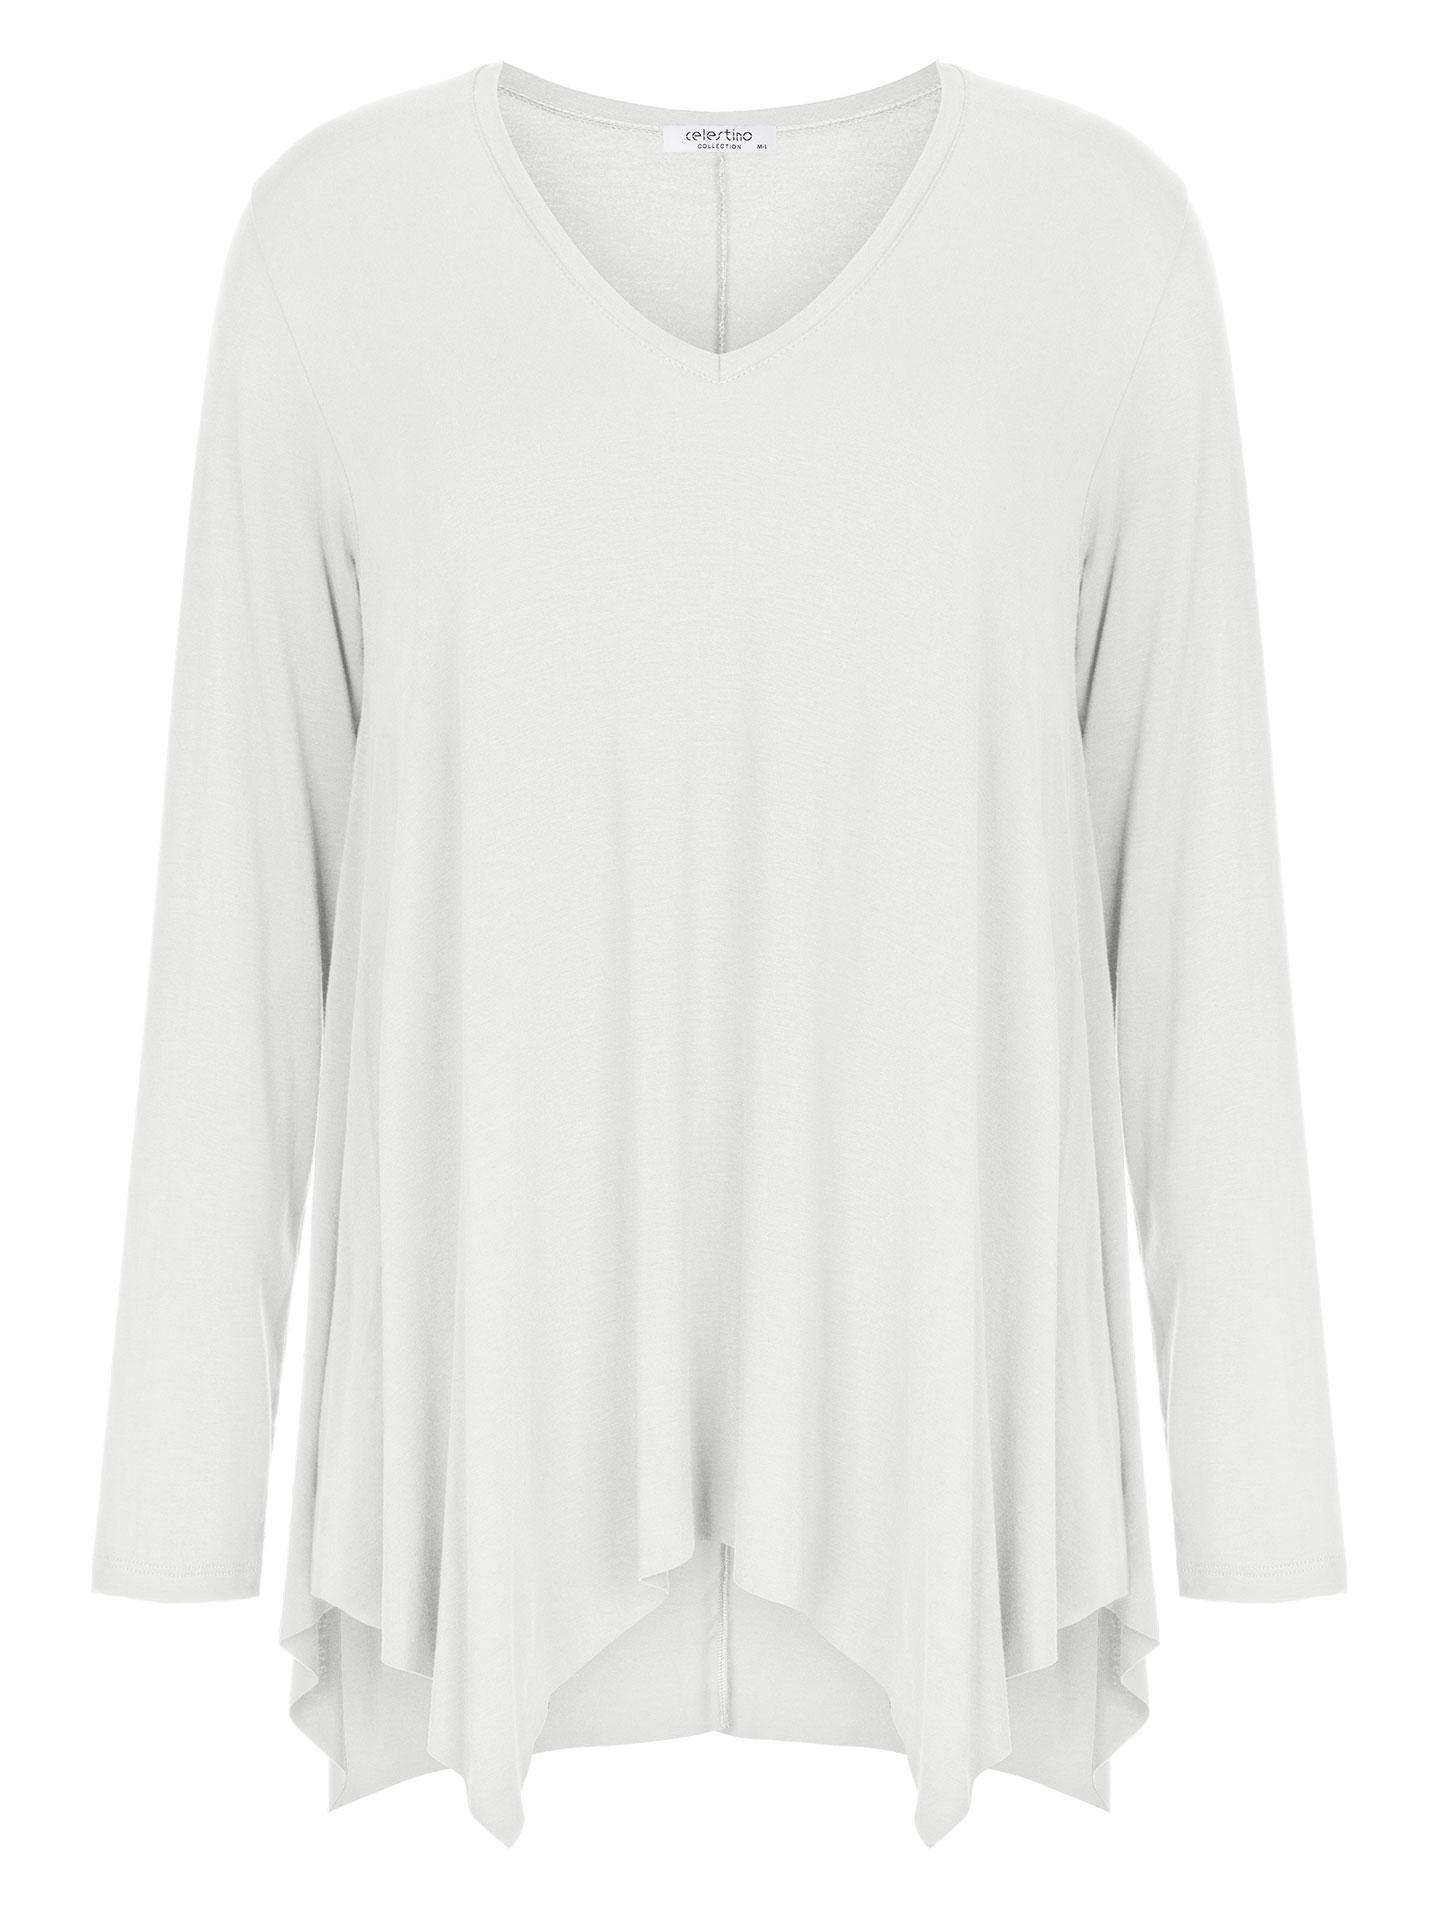 b0c03aa9e08e Plus size μπλούζα με μύτες WL4815.4001+7